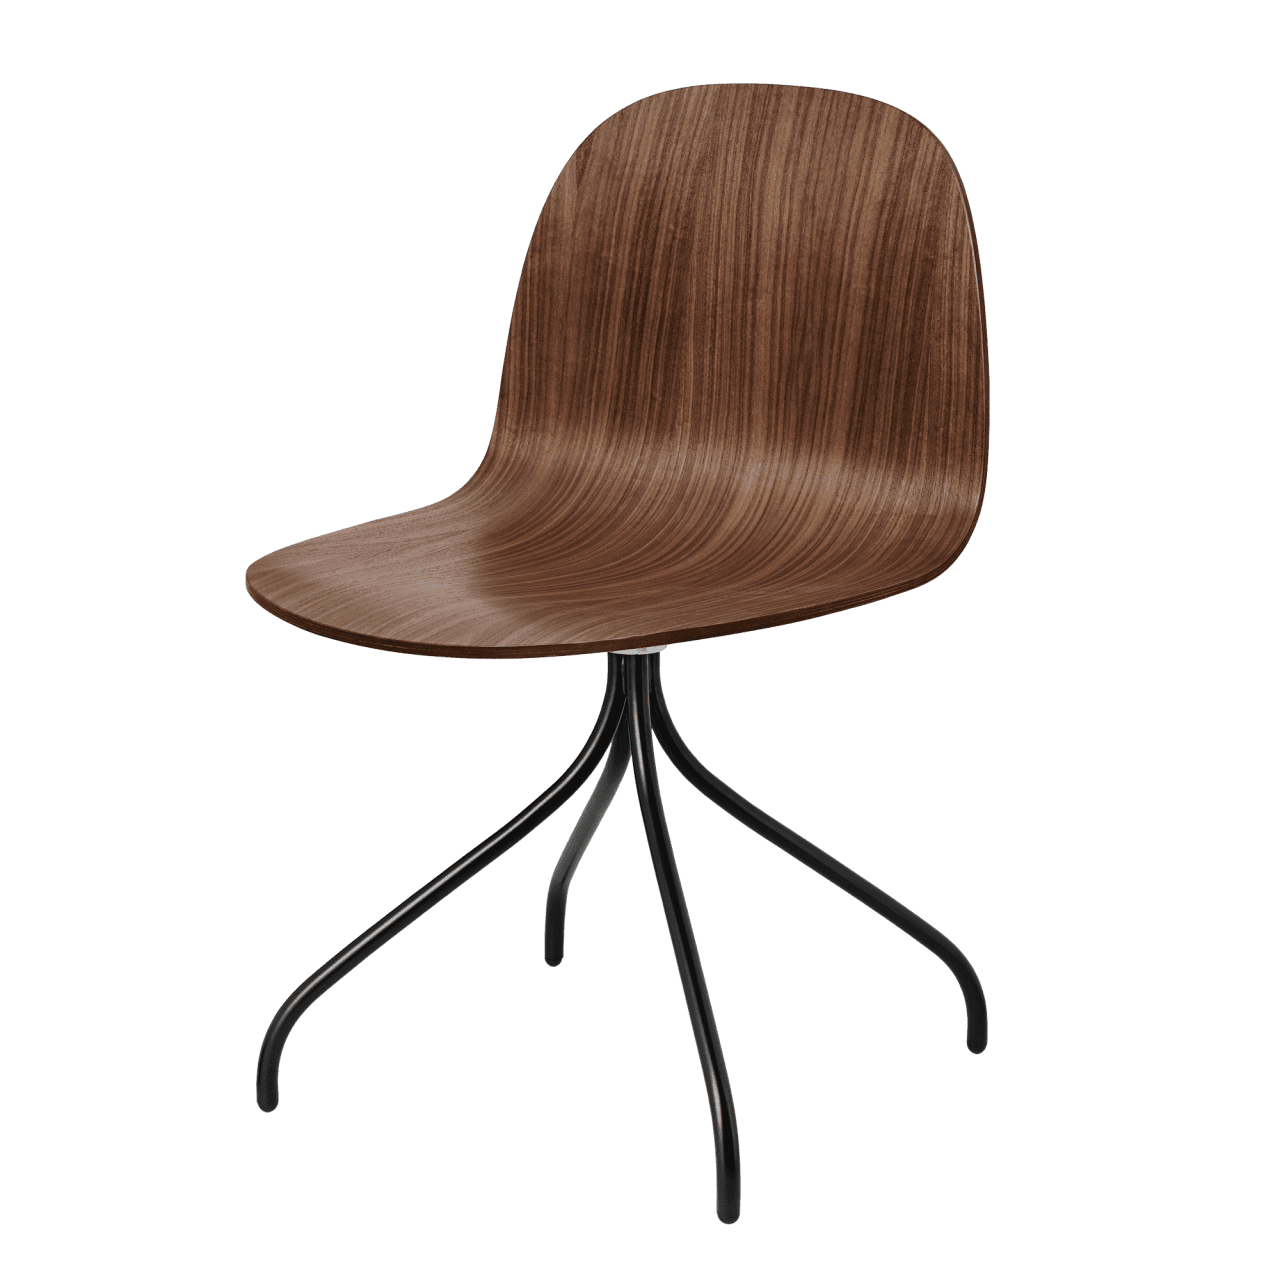 2D Meeting Chair Vierfußgestell